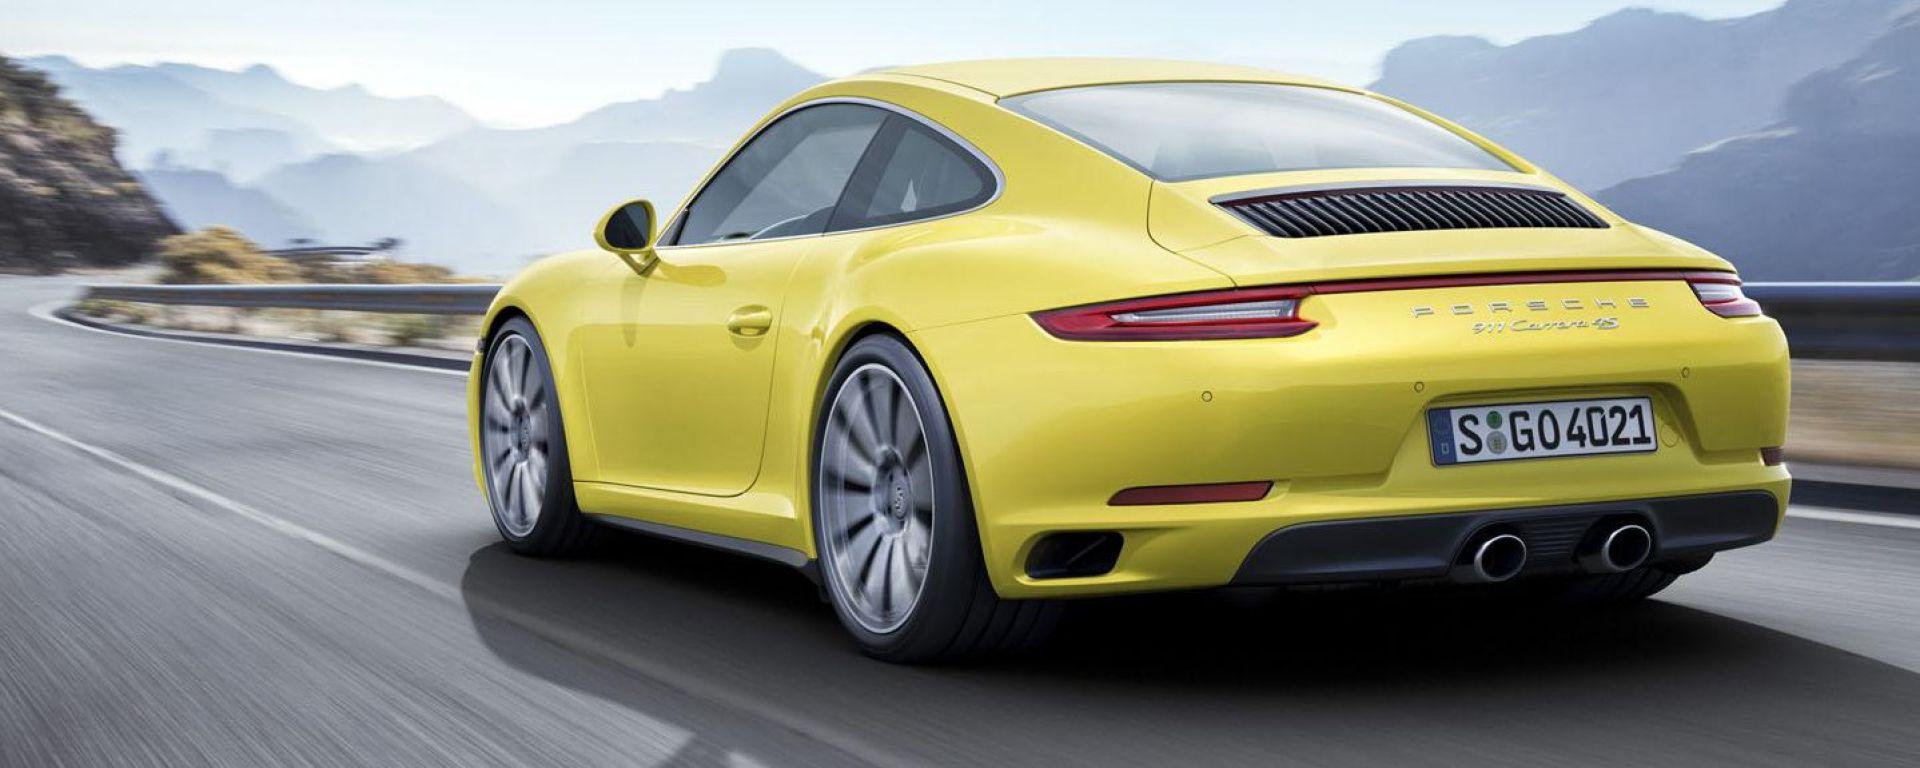 Porsche 911 Carrera 4 e 4S 2016